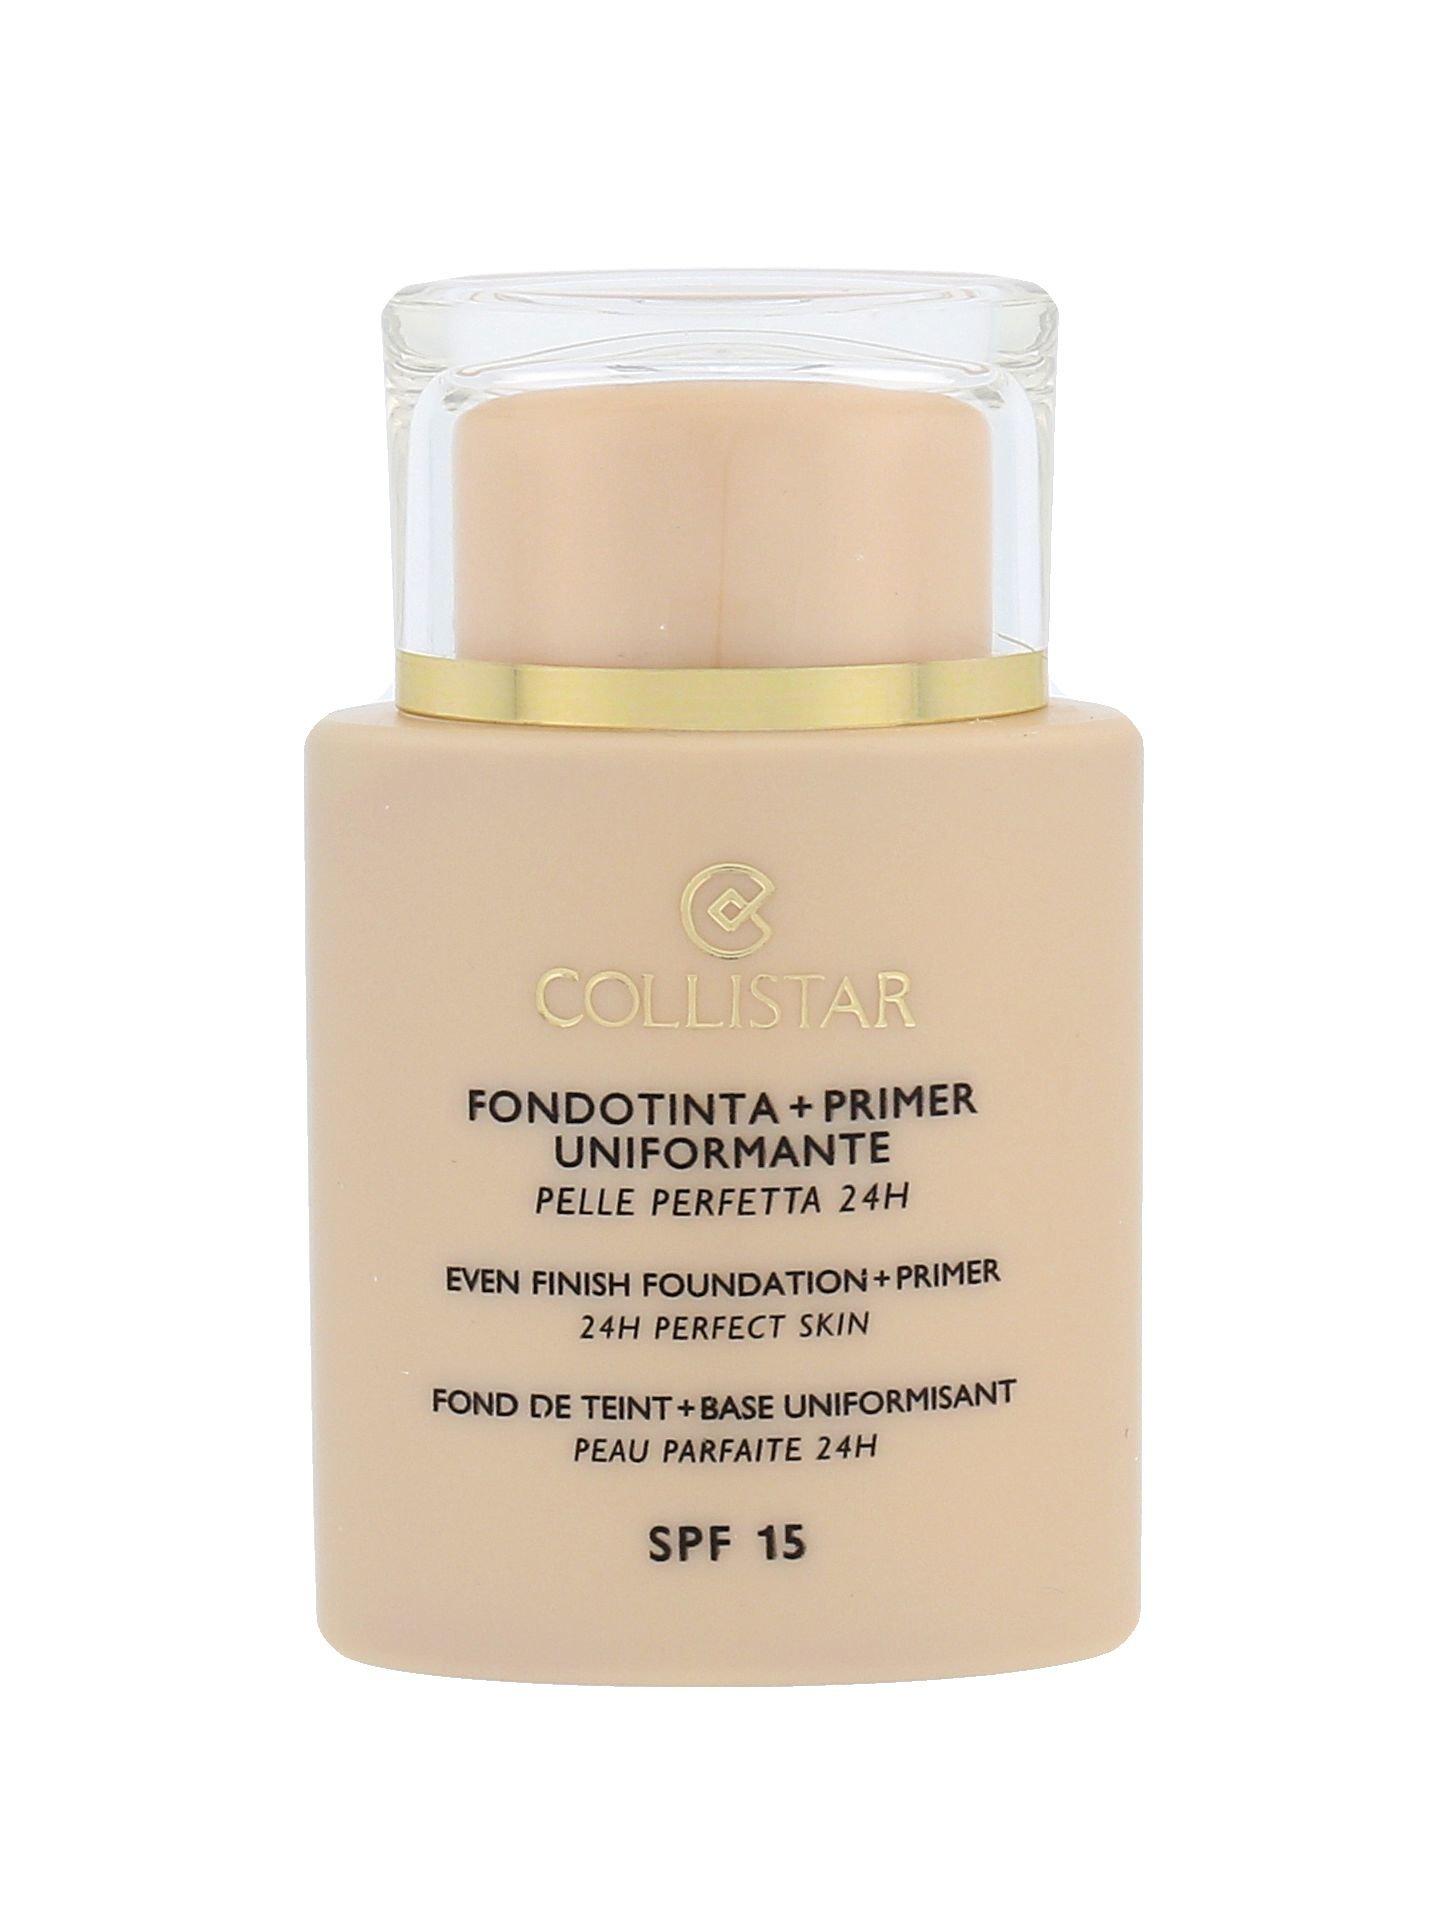 Collistar Evening Foundation + Primer Cosmetic 35ml 5 Amber